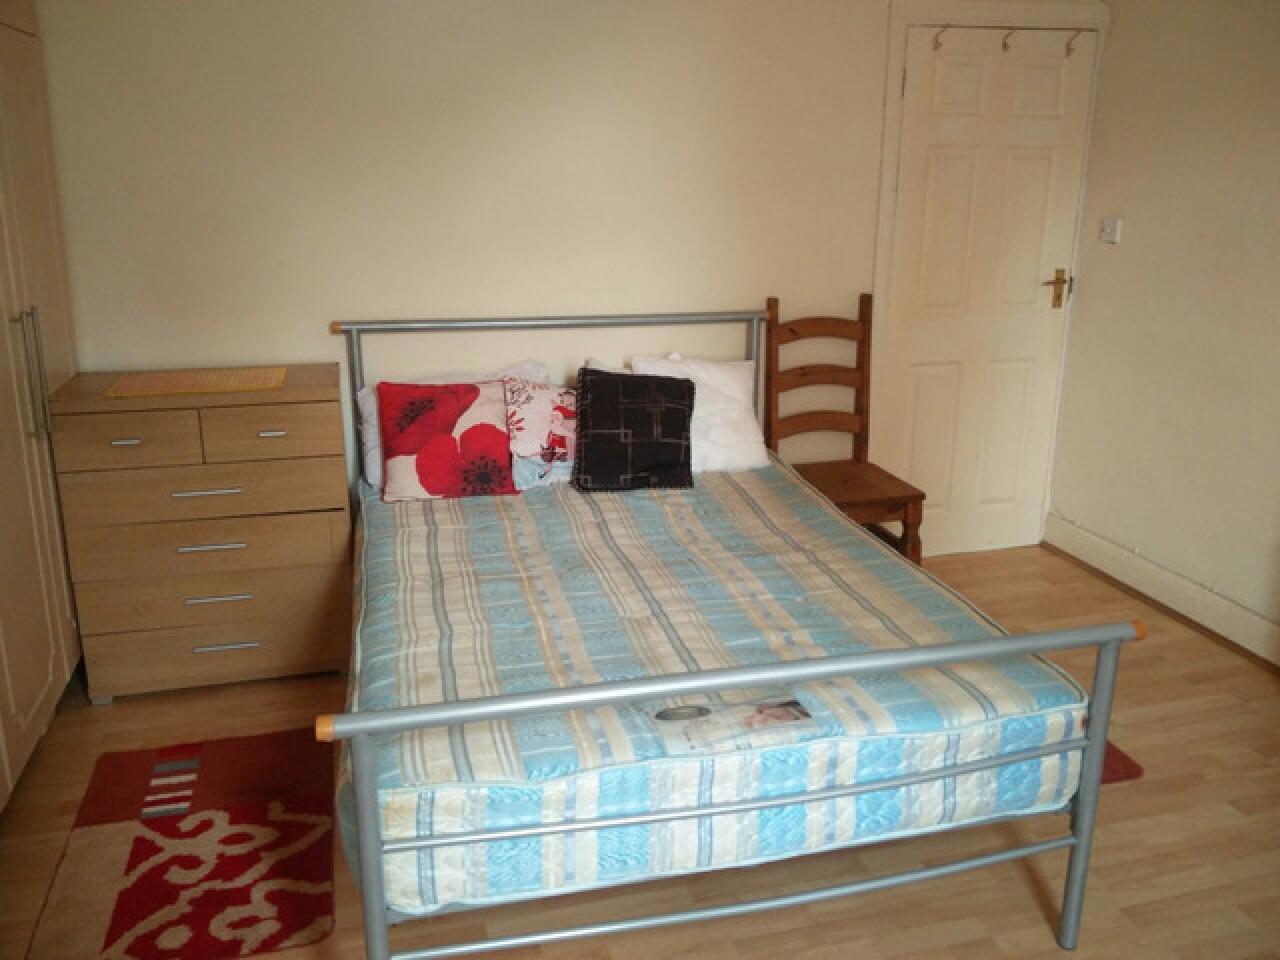 Сдаю Double Room Hounslow central - Hounslow East - 3